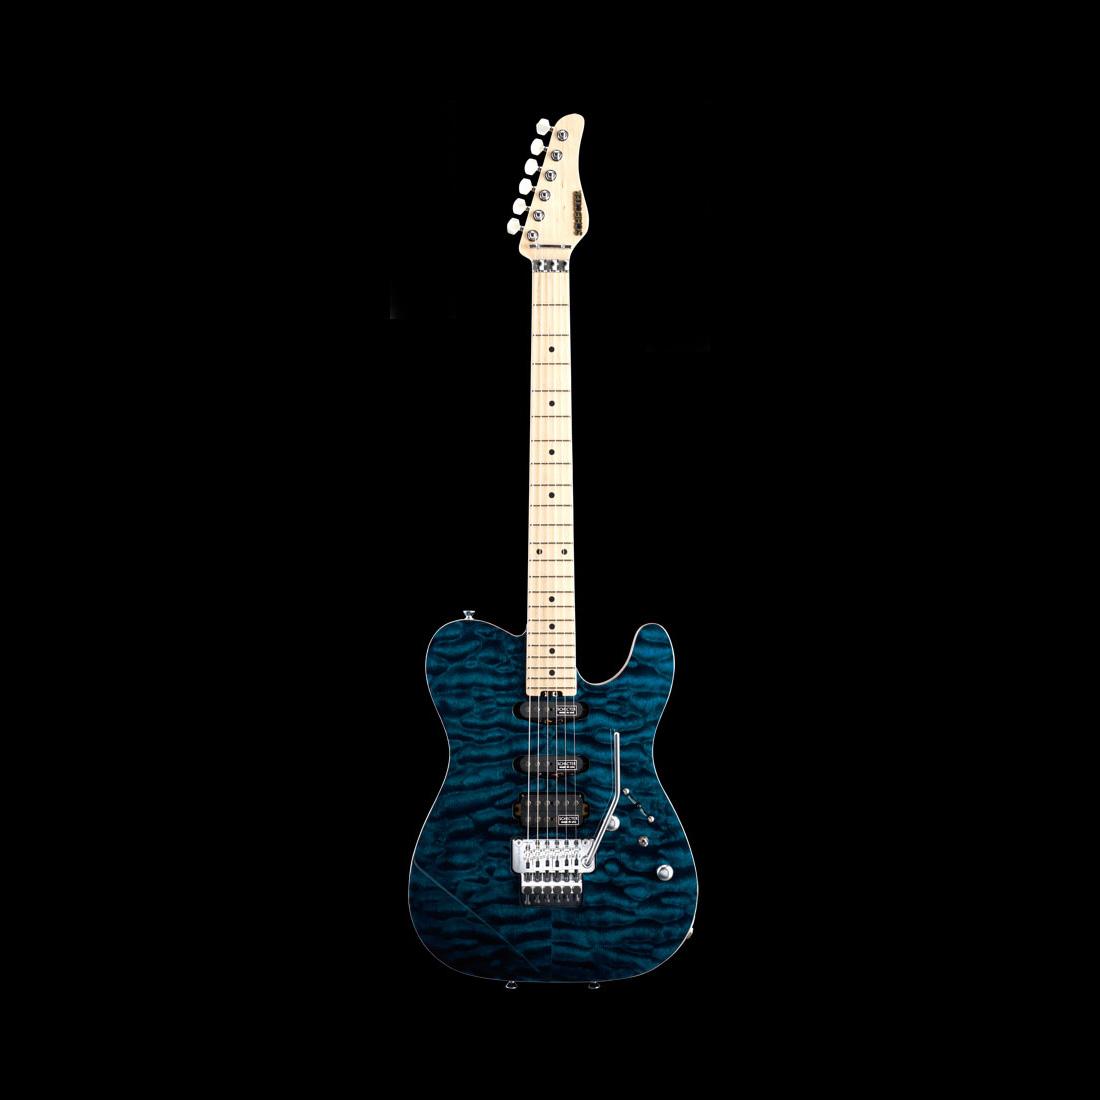 Schecter / PT-IV-CTM-FRT M Black Aqua シェクター エレキギター 《受注生産:予約受付中》